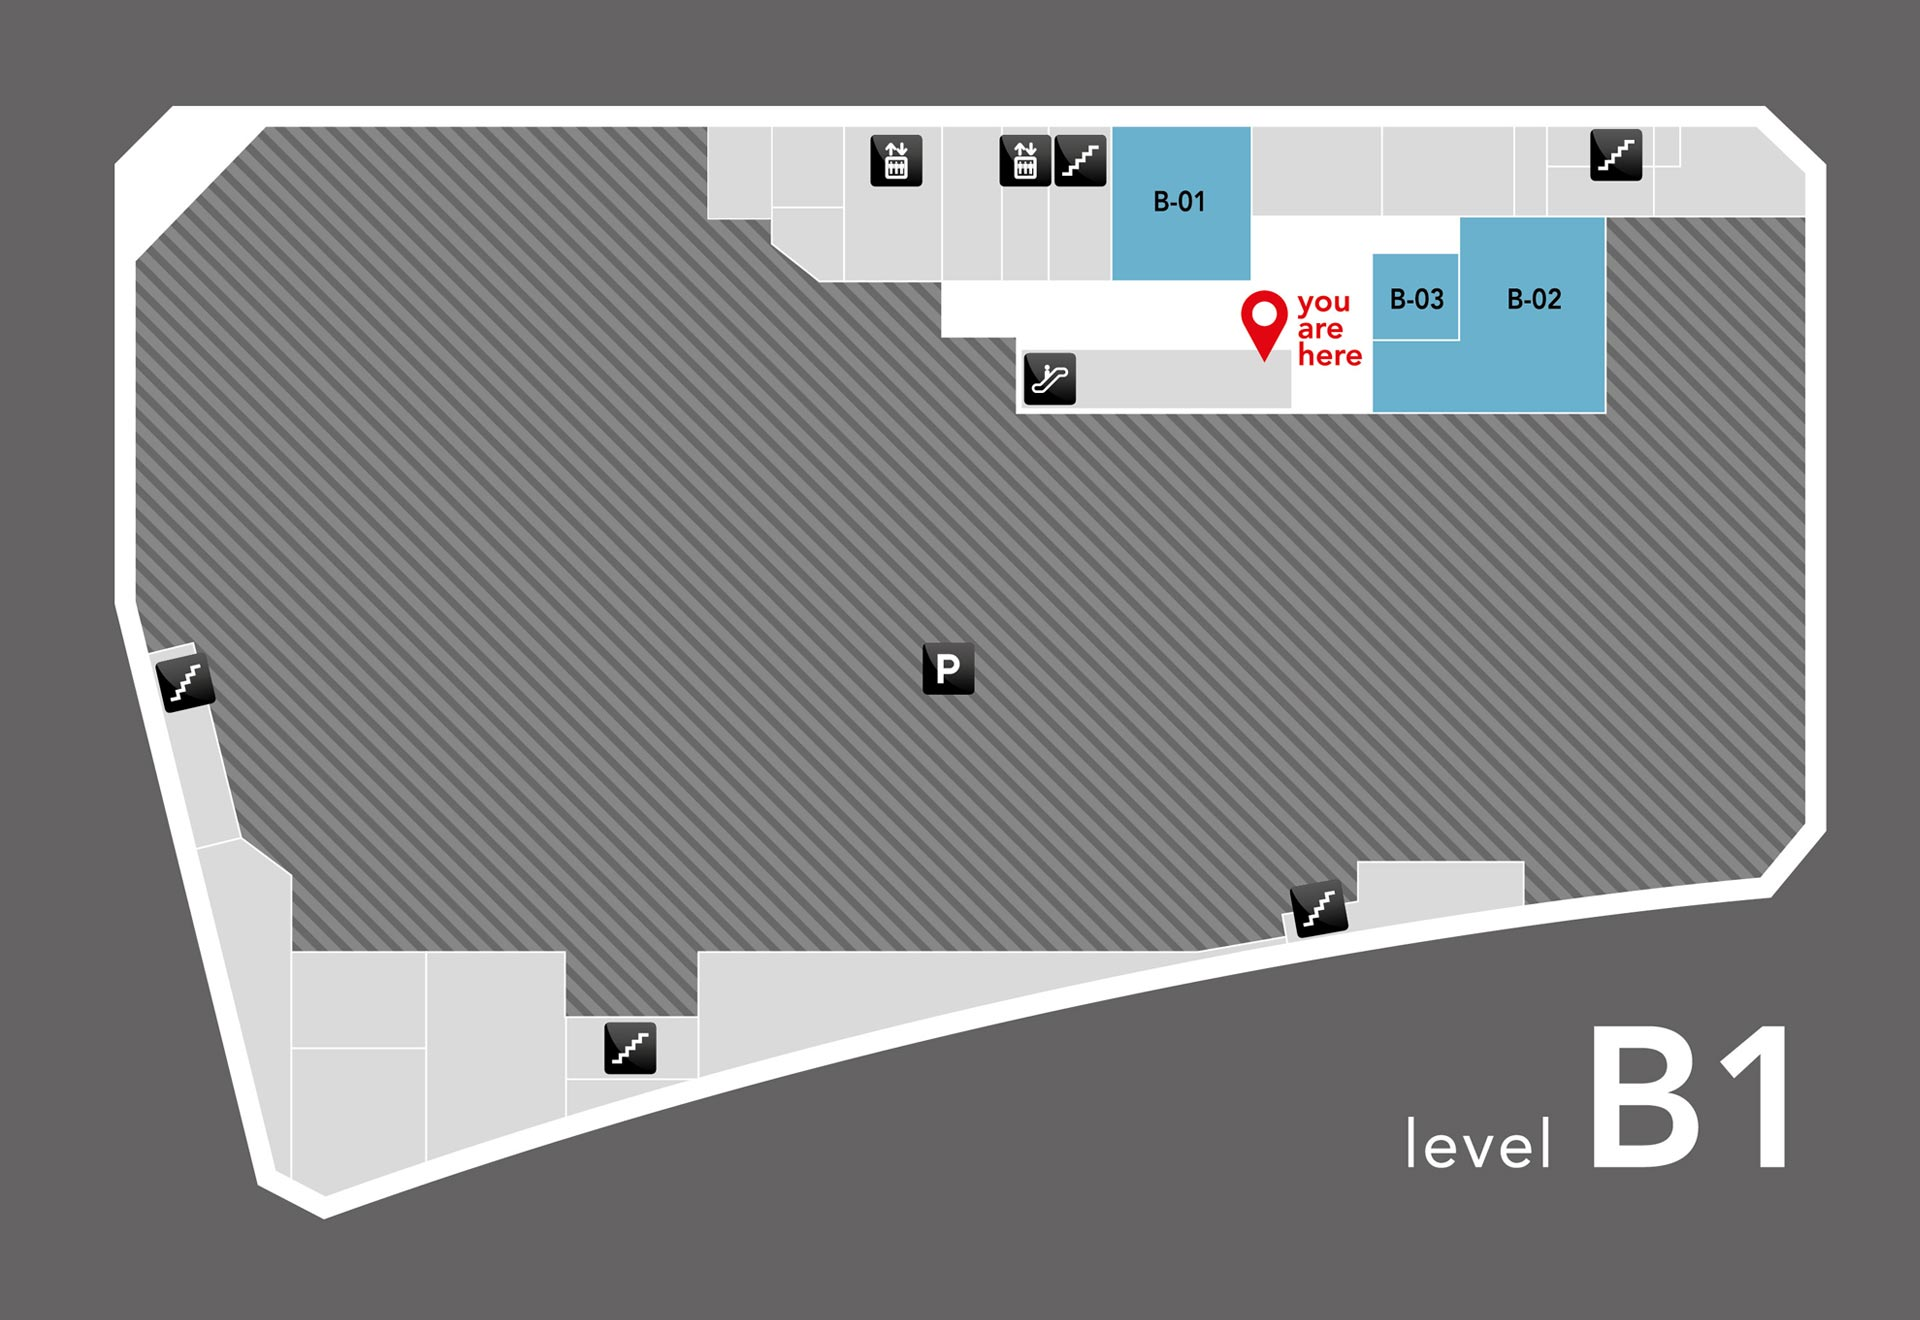 ss15courtyard-directory-plan-b1